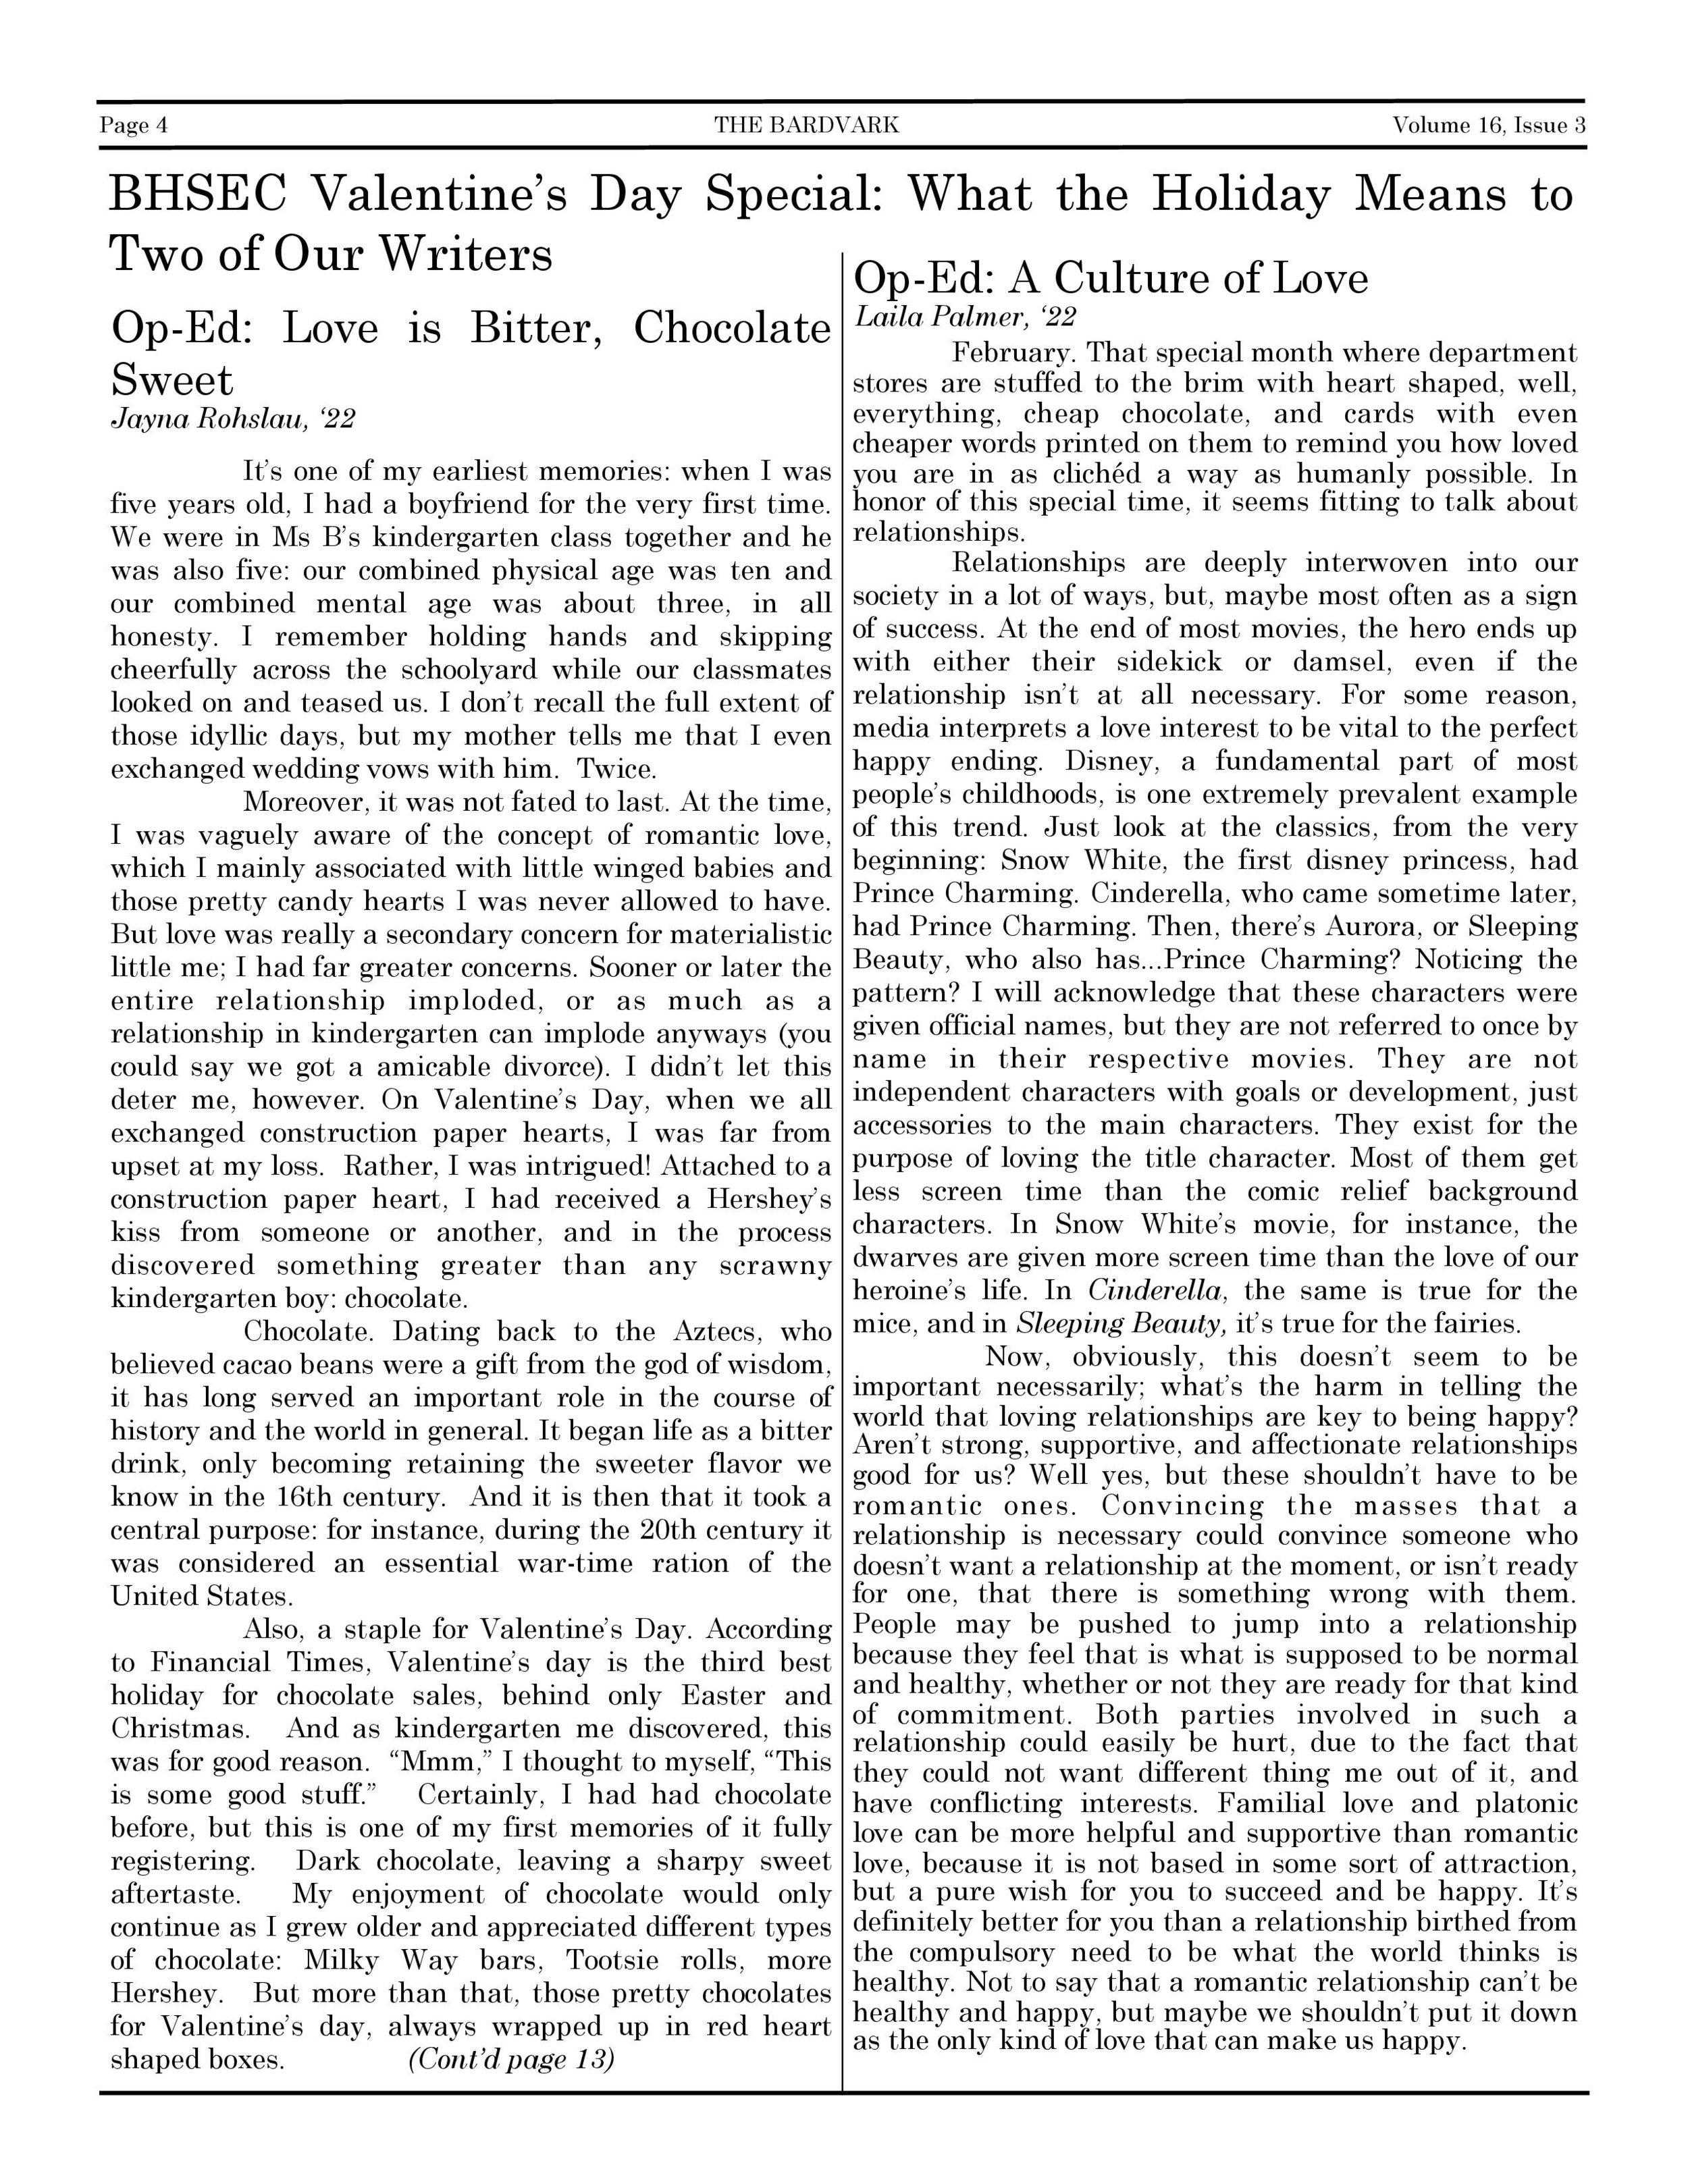 Issue 6 February 2019-4.jpg